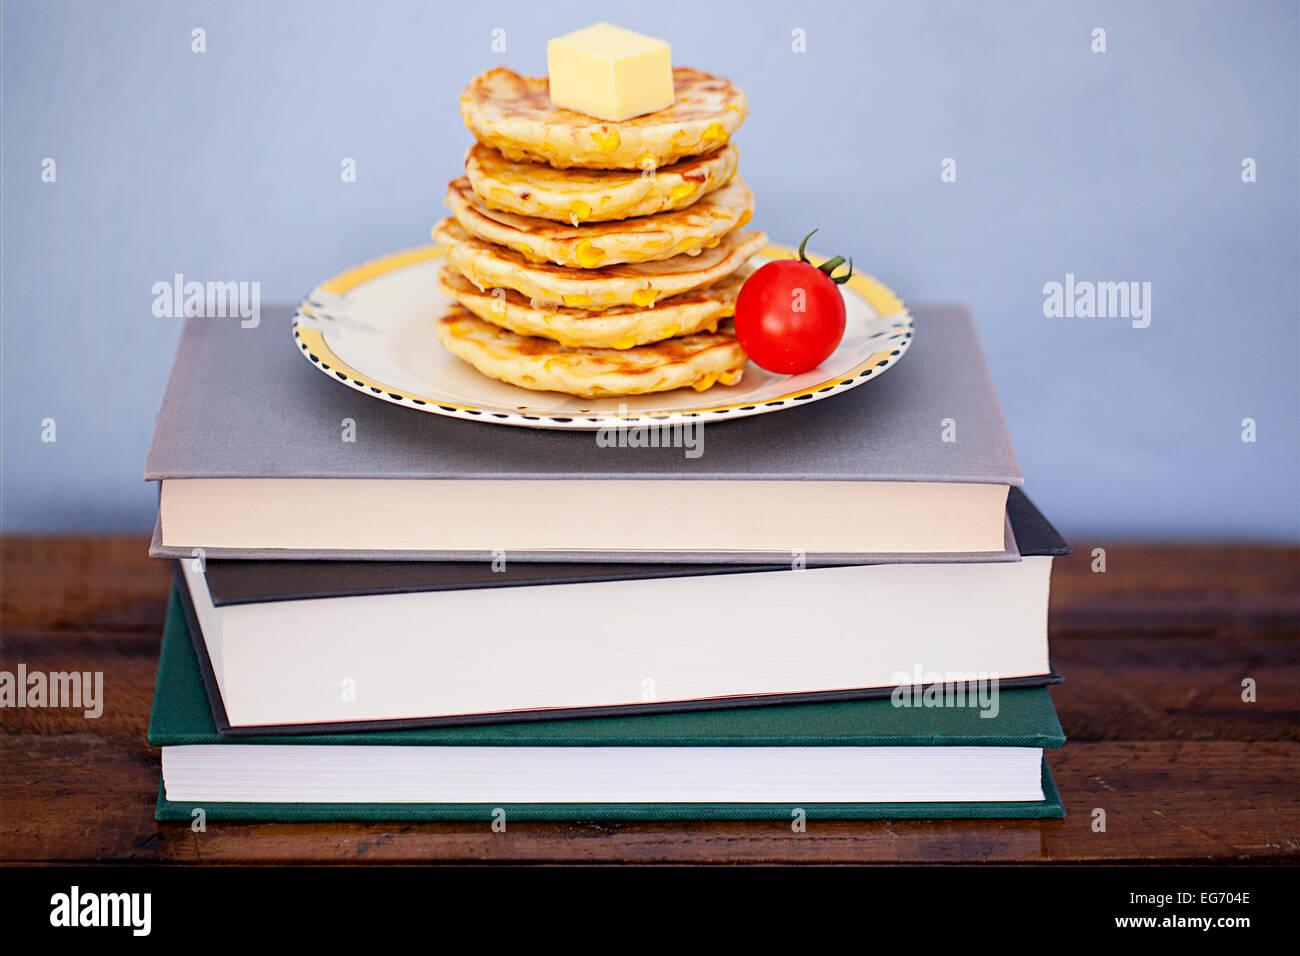 corn fritters flapjacks cheese and tomatoe - Stock Image